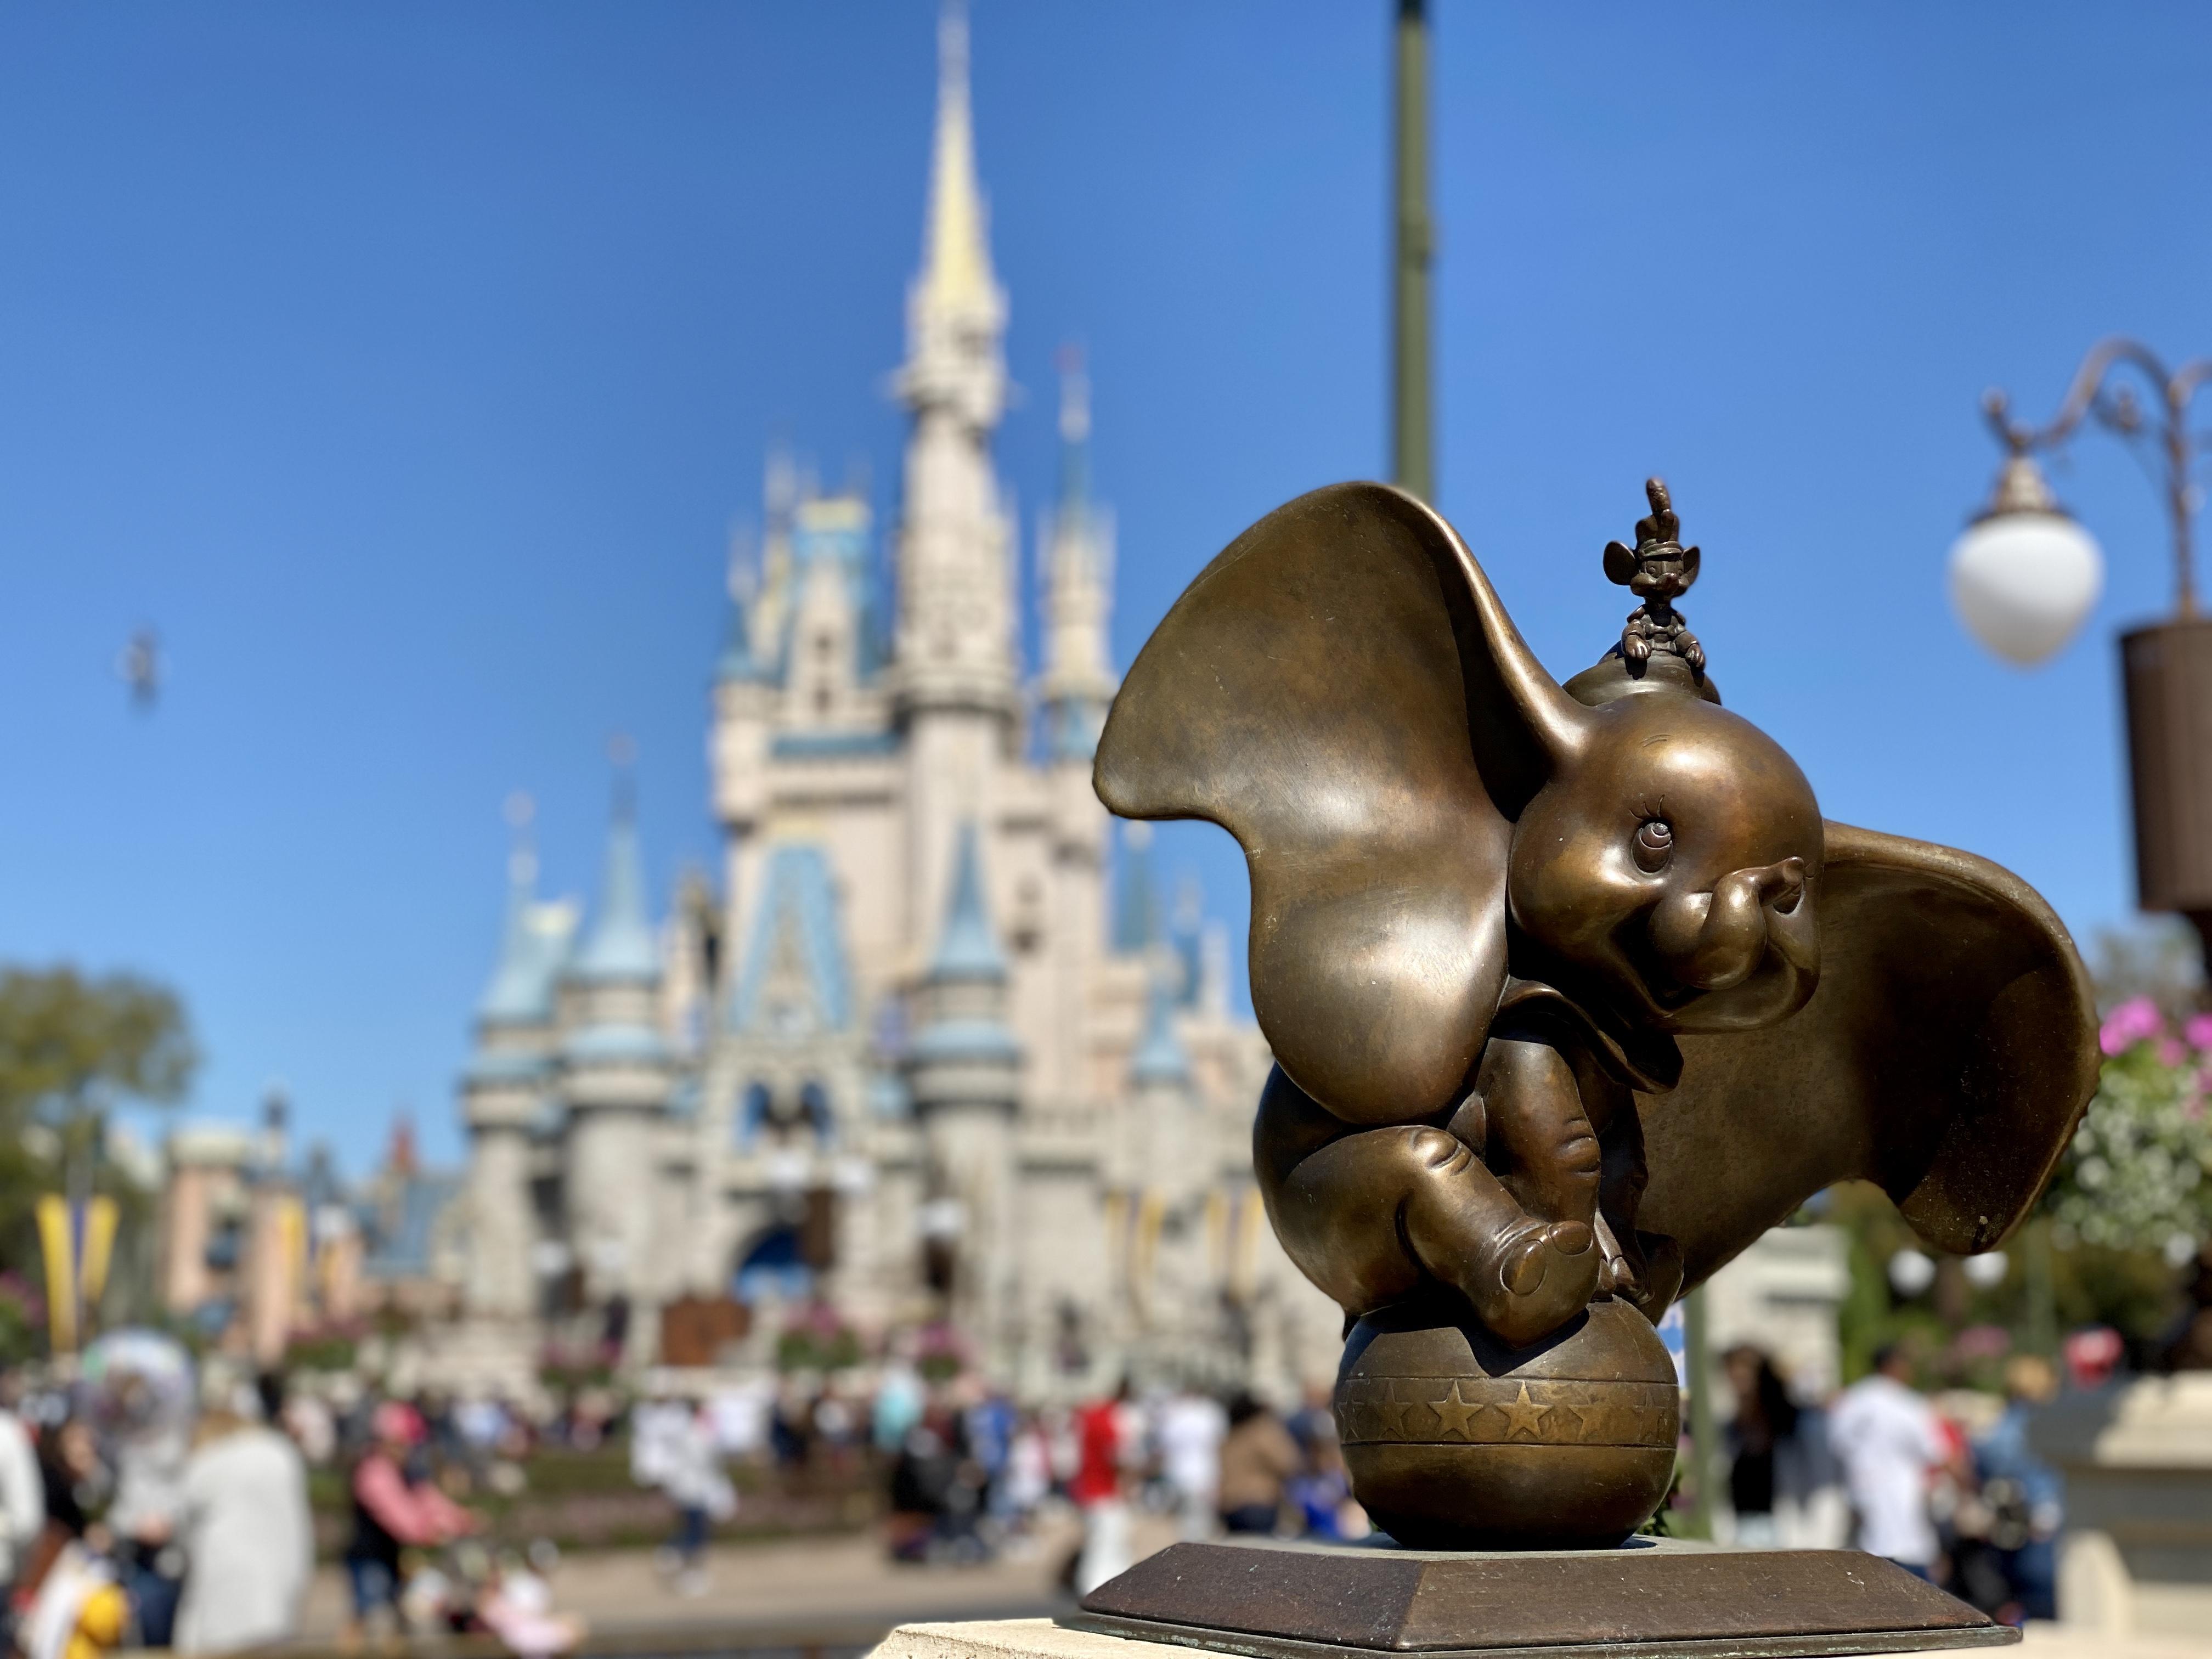 Cinderella castle dumbo